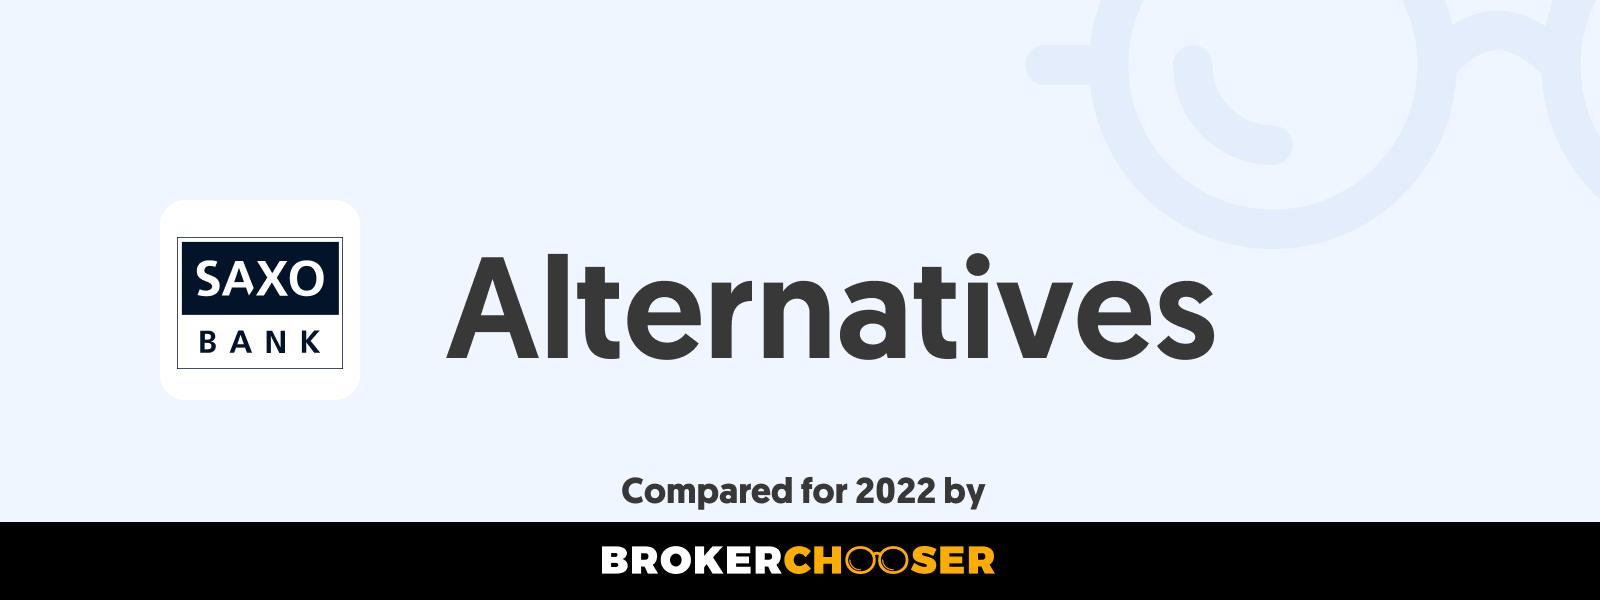 Saxo Bank Alternatives